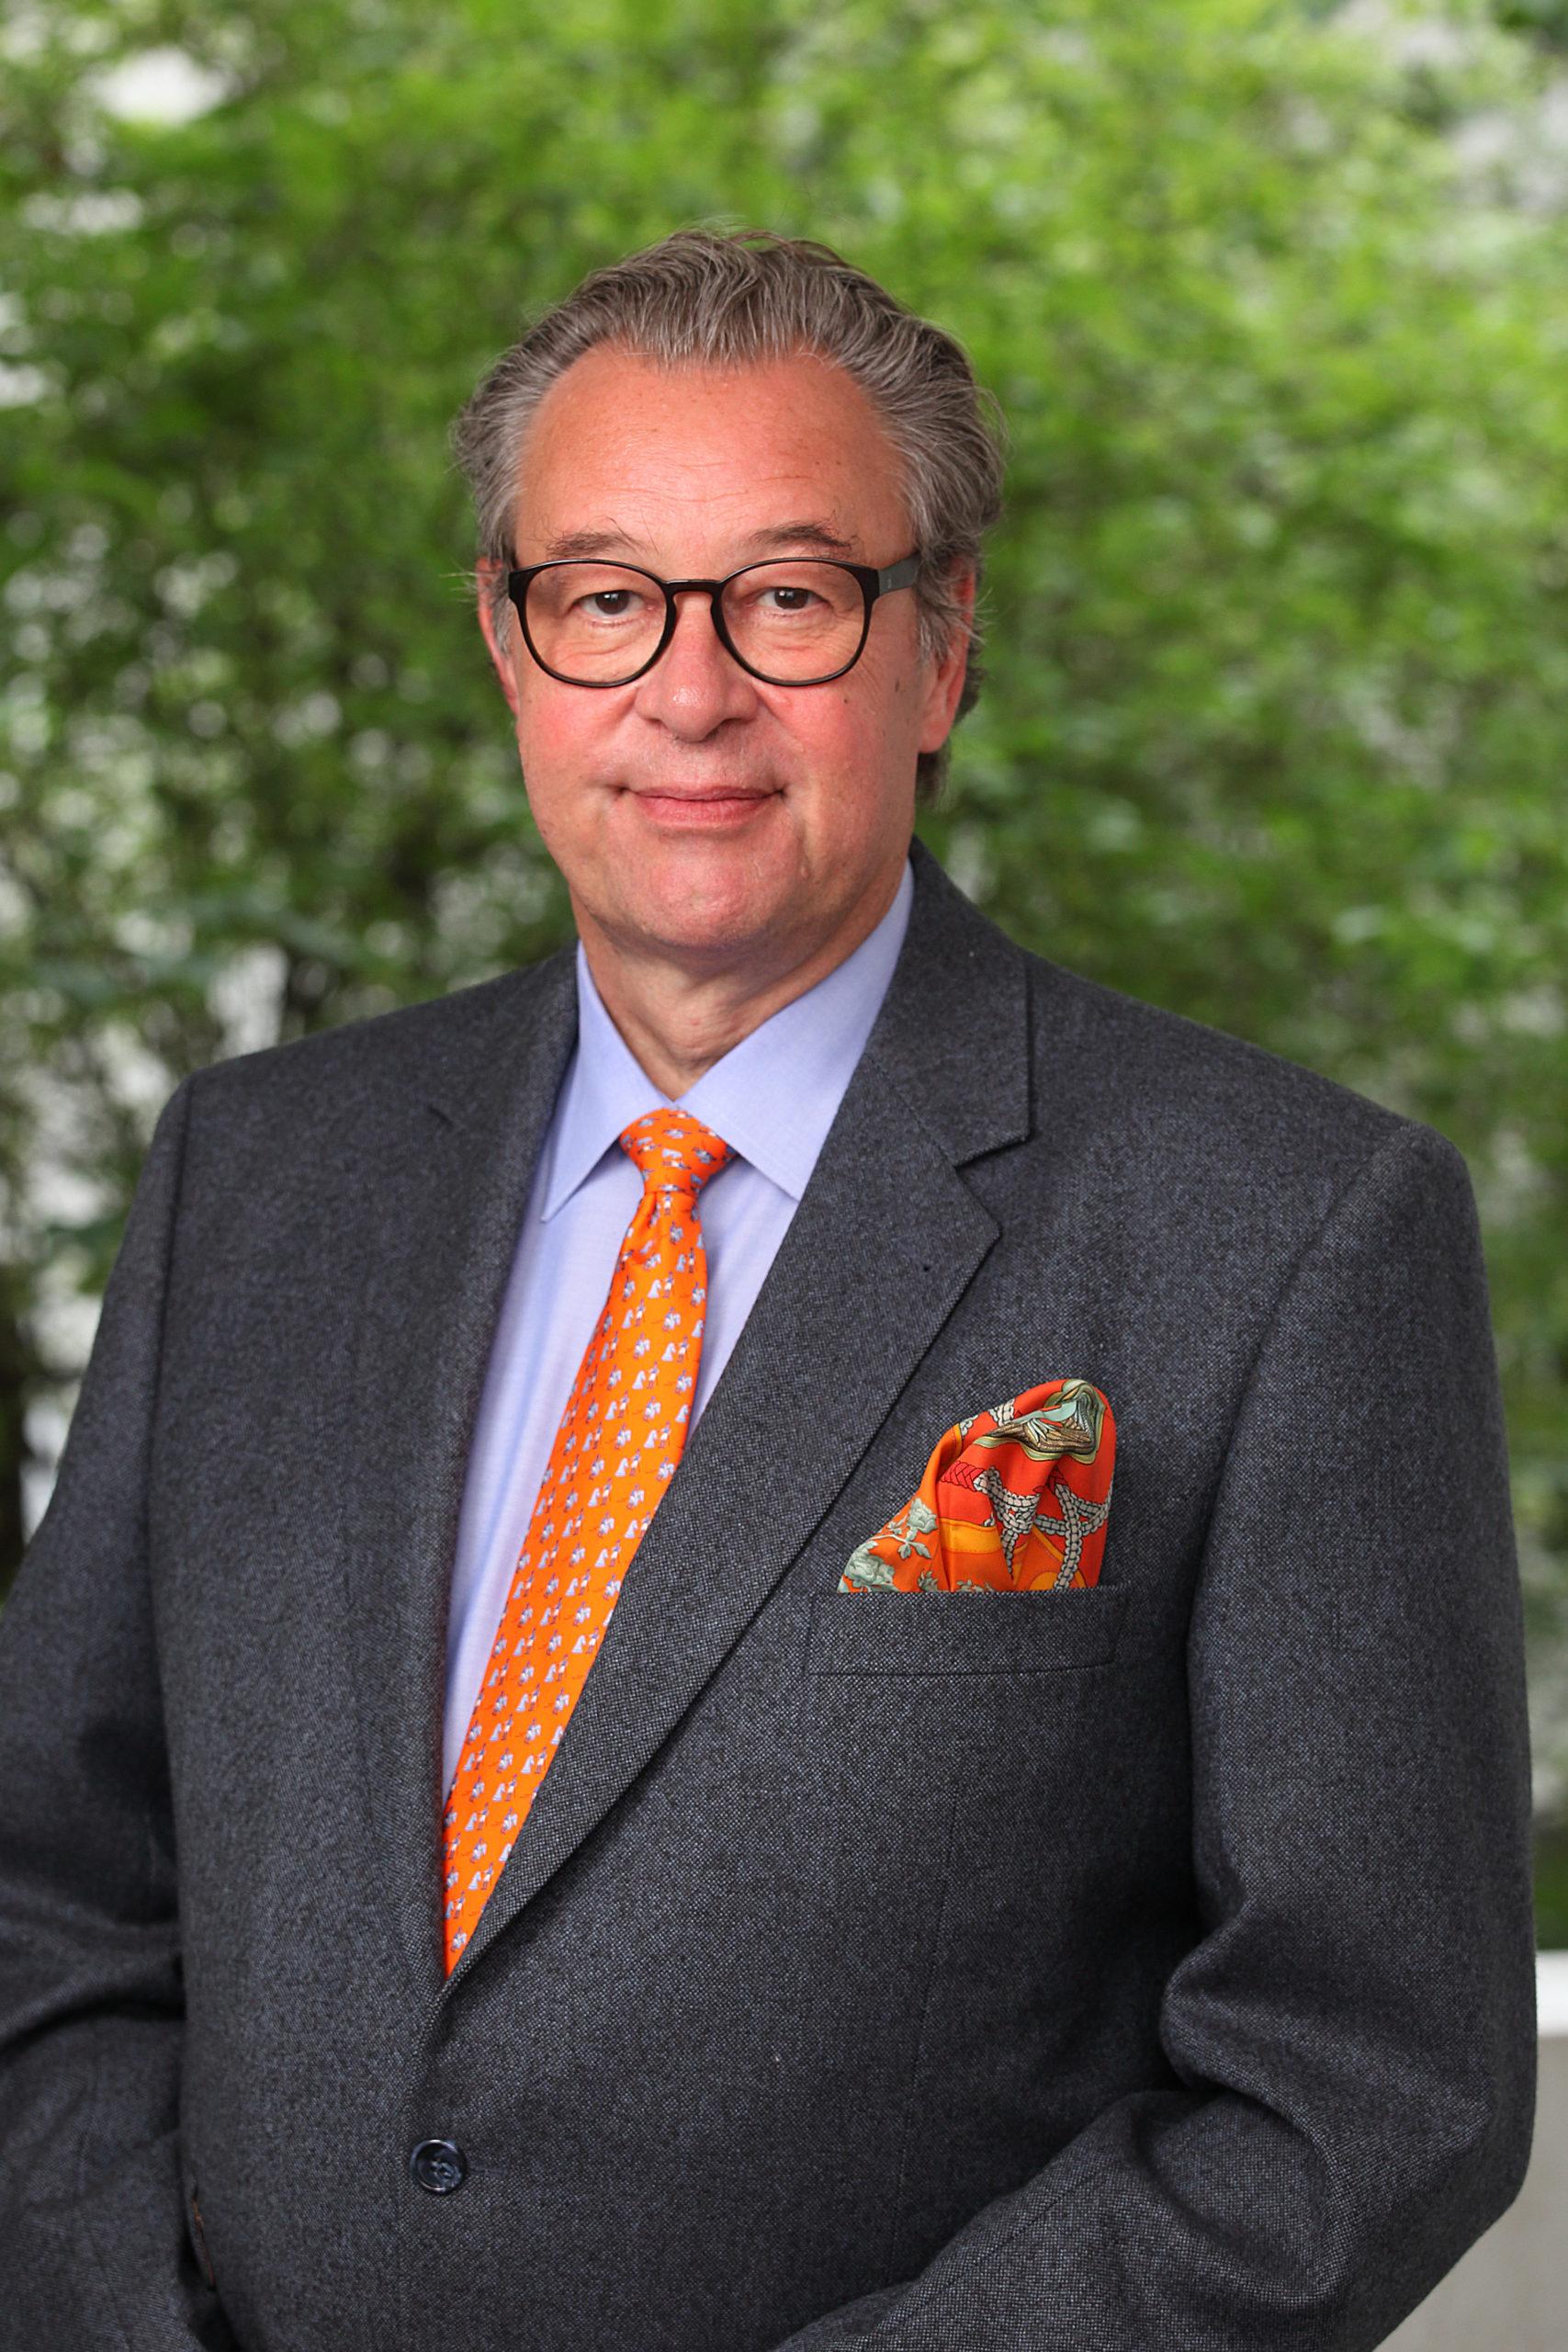 Dr. Jürgen Graf